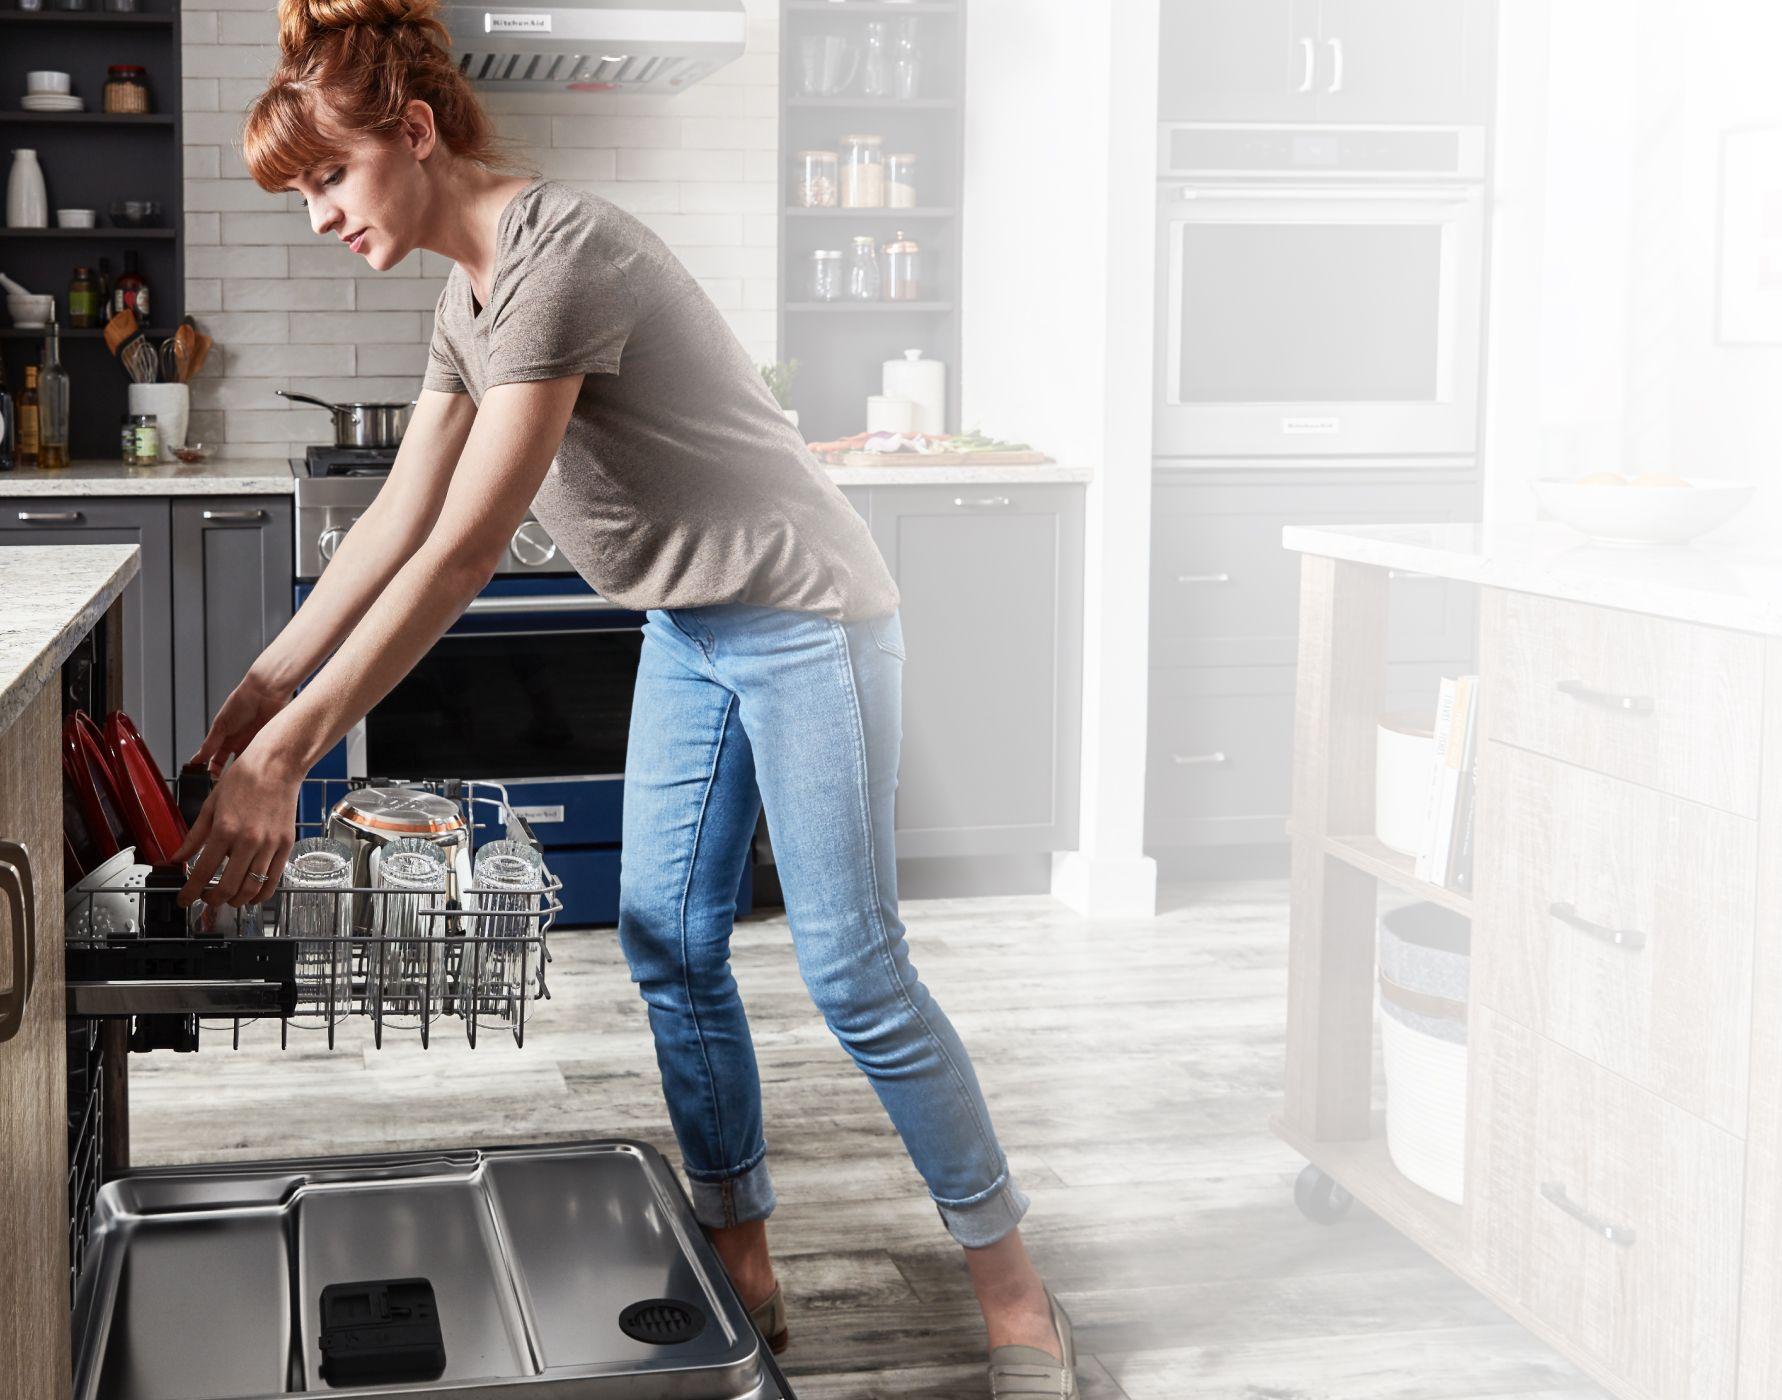 A person unloading their FreeFlex™ Third Rack Dishwasher.